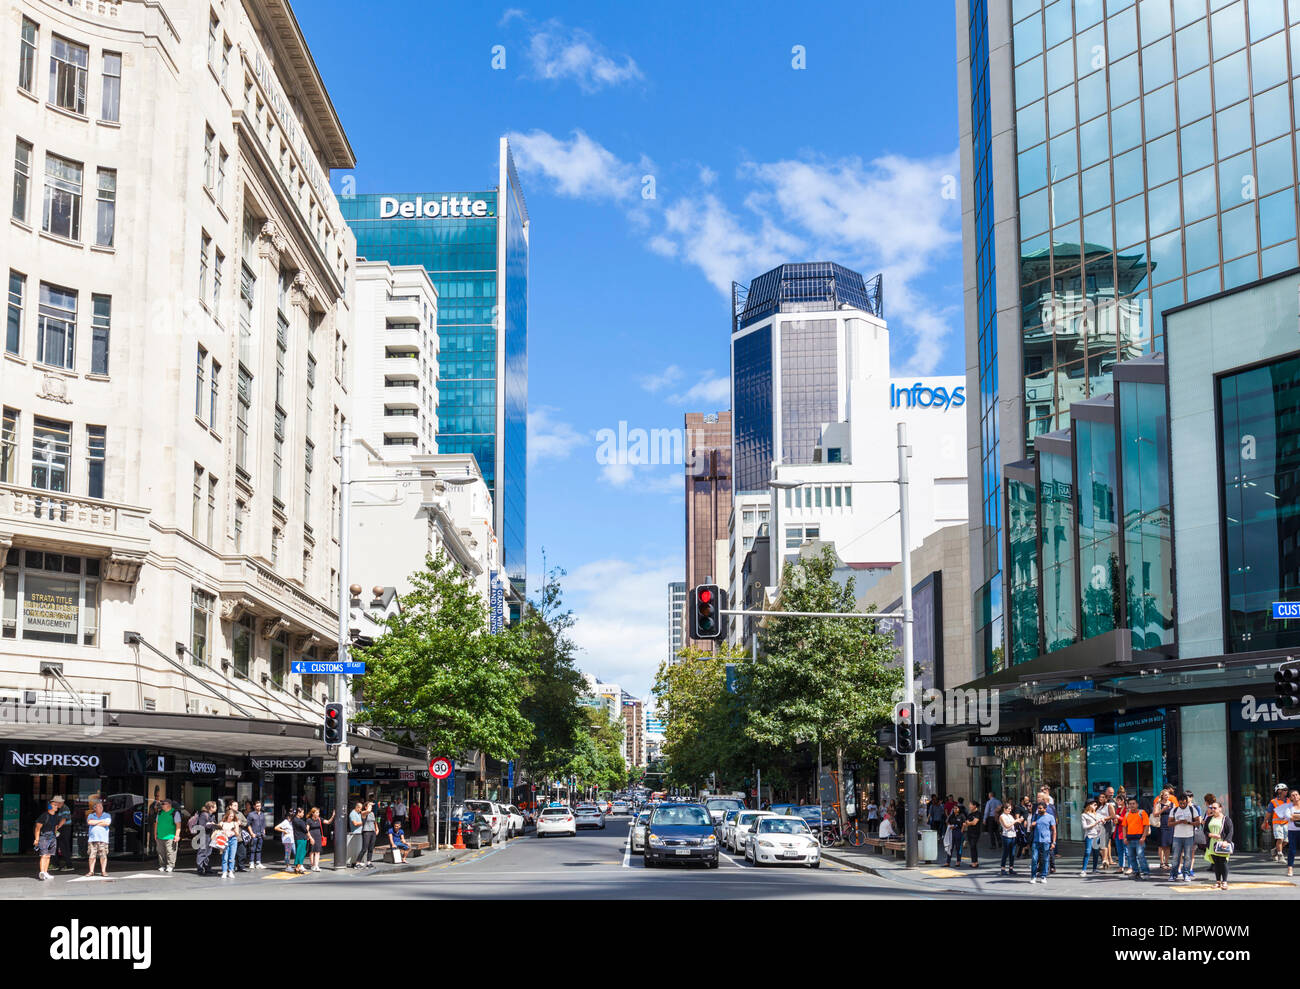 Neuseeland Auckland Neuseeland Verkehr in Warteschlange Queen Street Shopping Street Stadtzentrum Auckland Nordinsel Neuseeland Stockbild